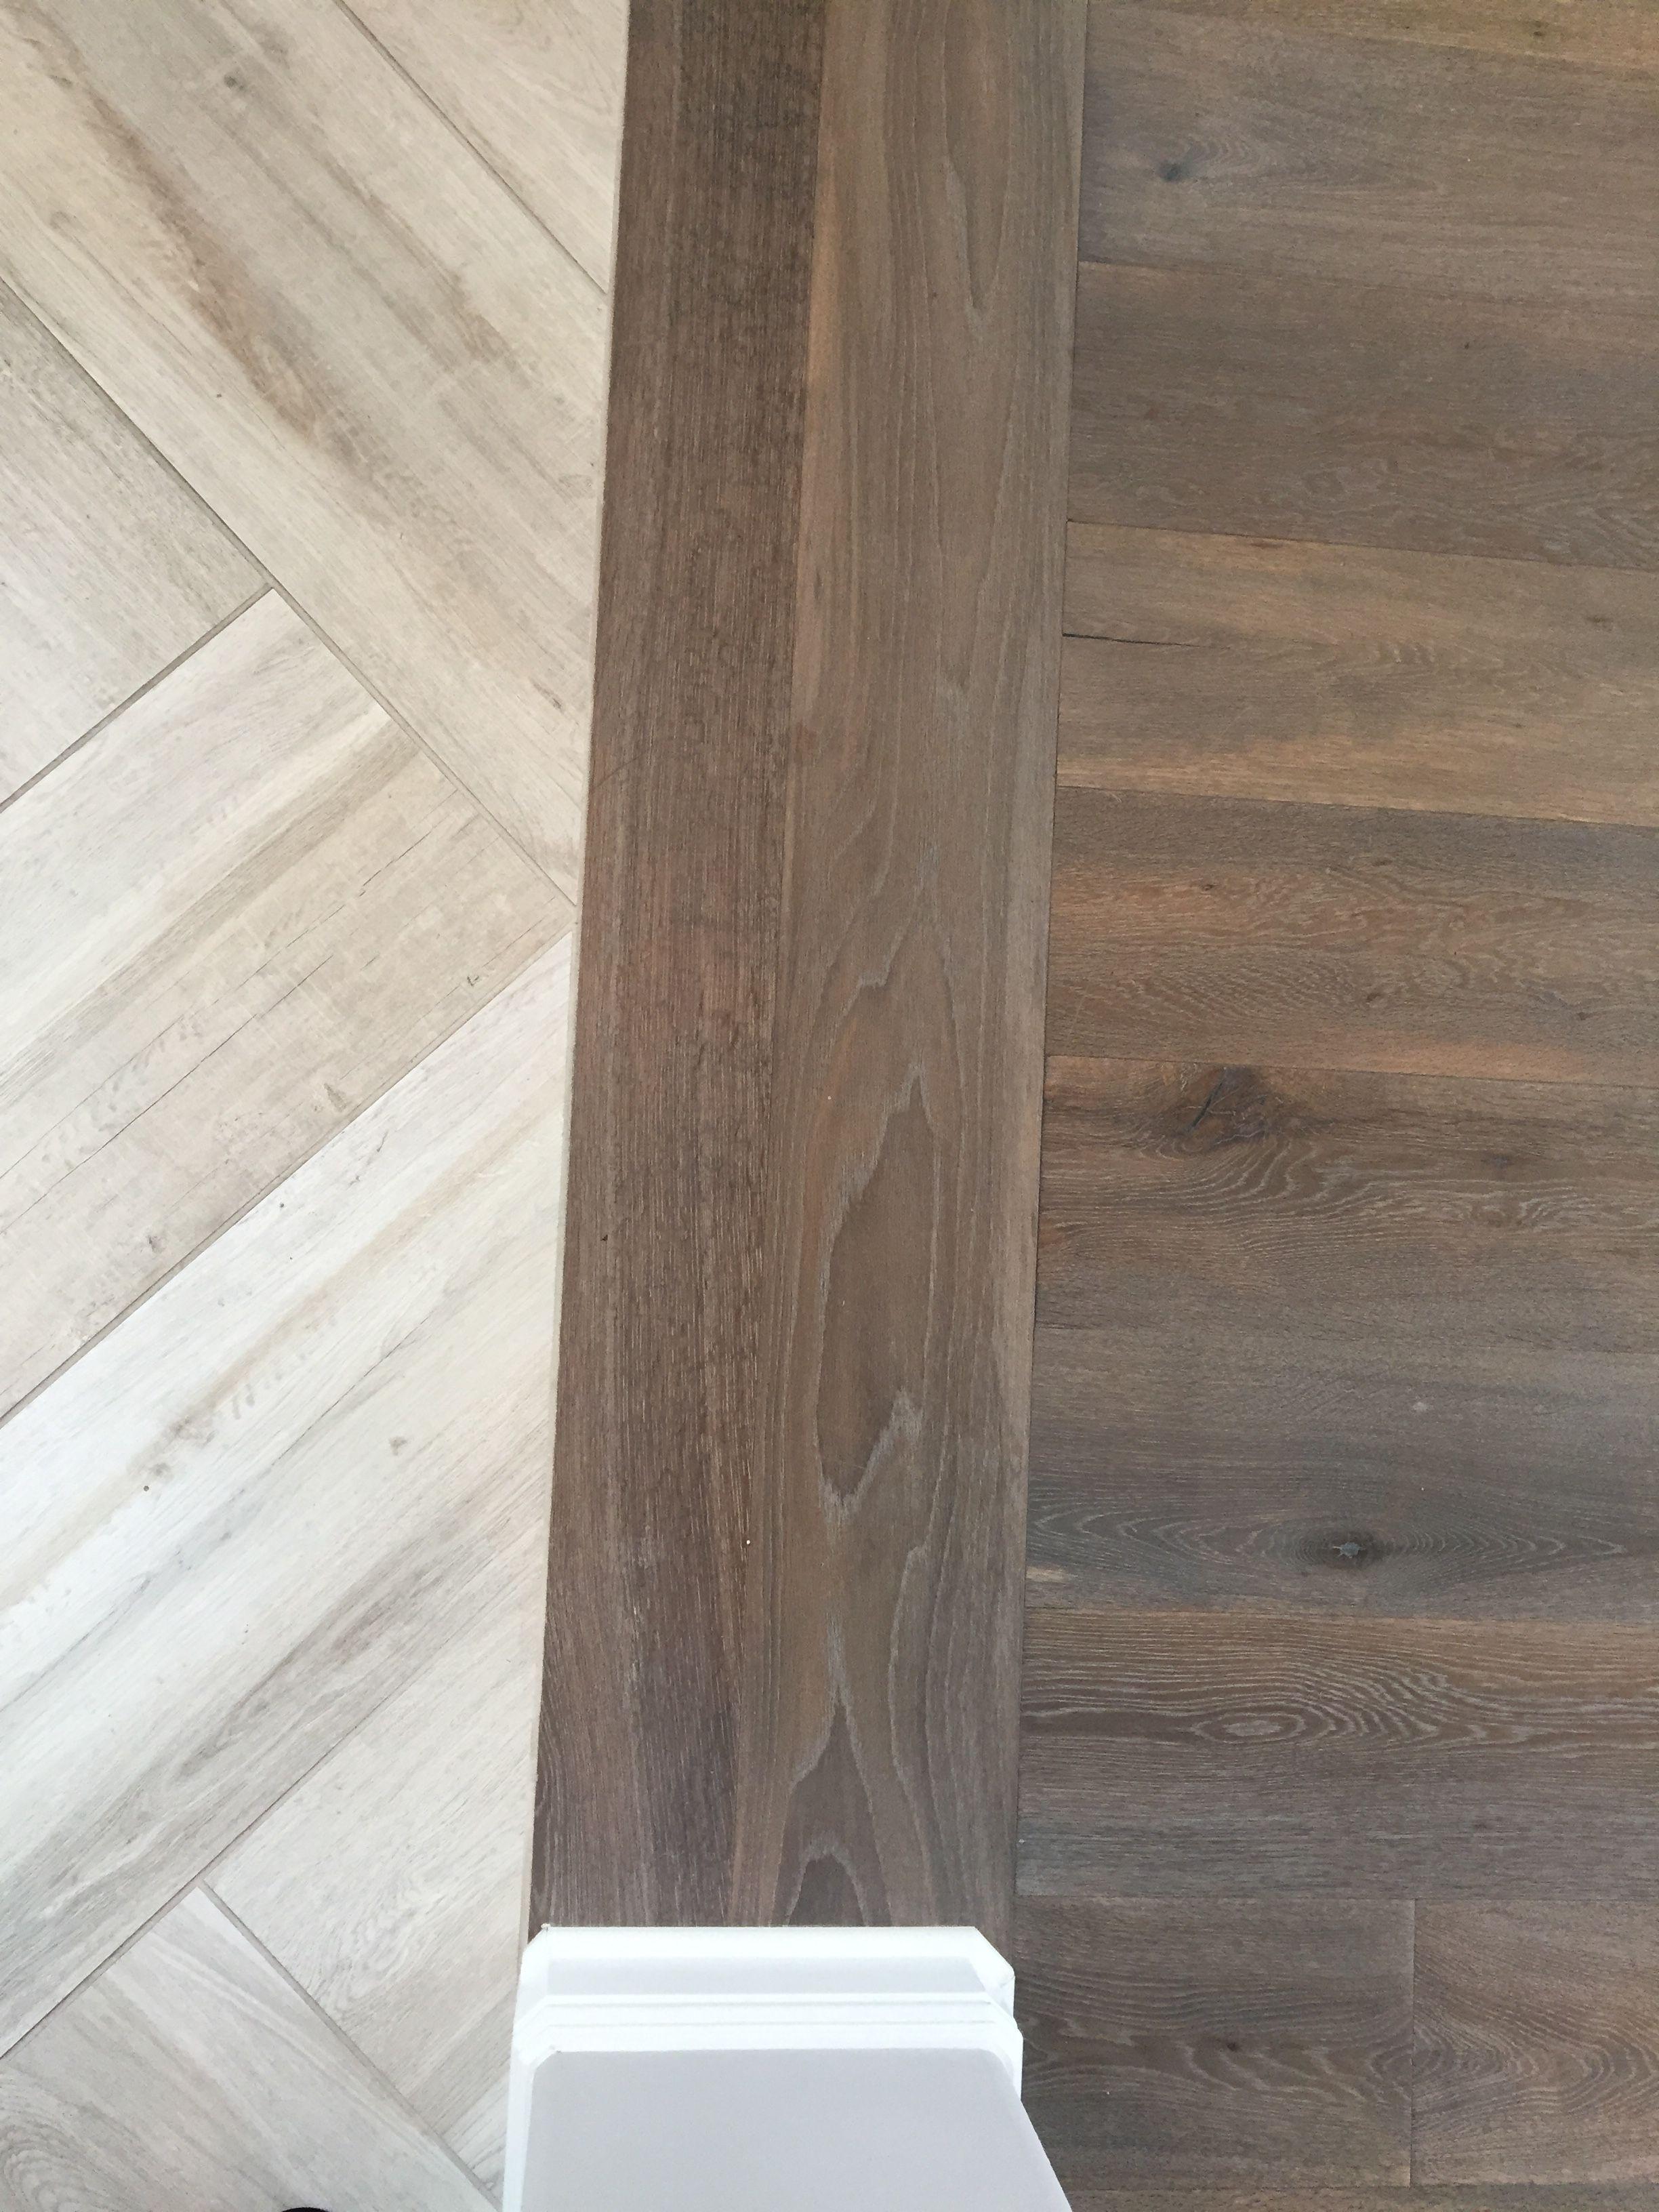 hardwood flooring glasgow hillington of floor transition laminate to herringbone tile pattern model with regard to floor transition laminate to herringbone tile pattern herringbone tile pattern herringbone wood floor